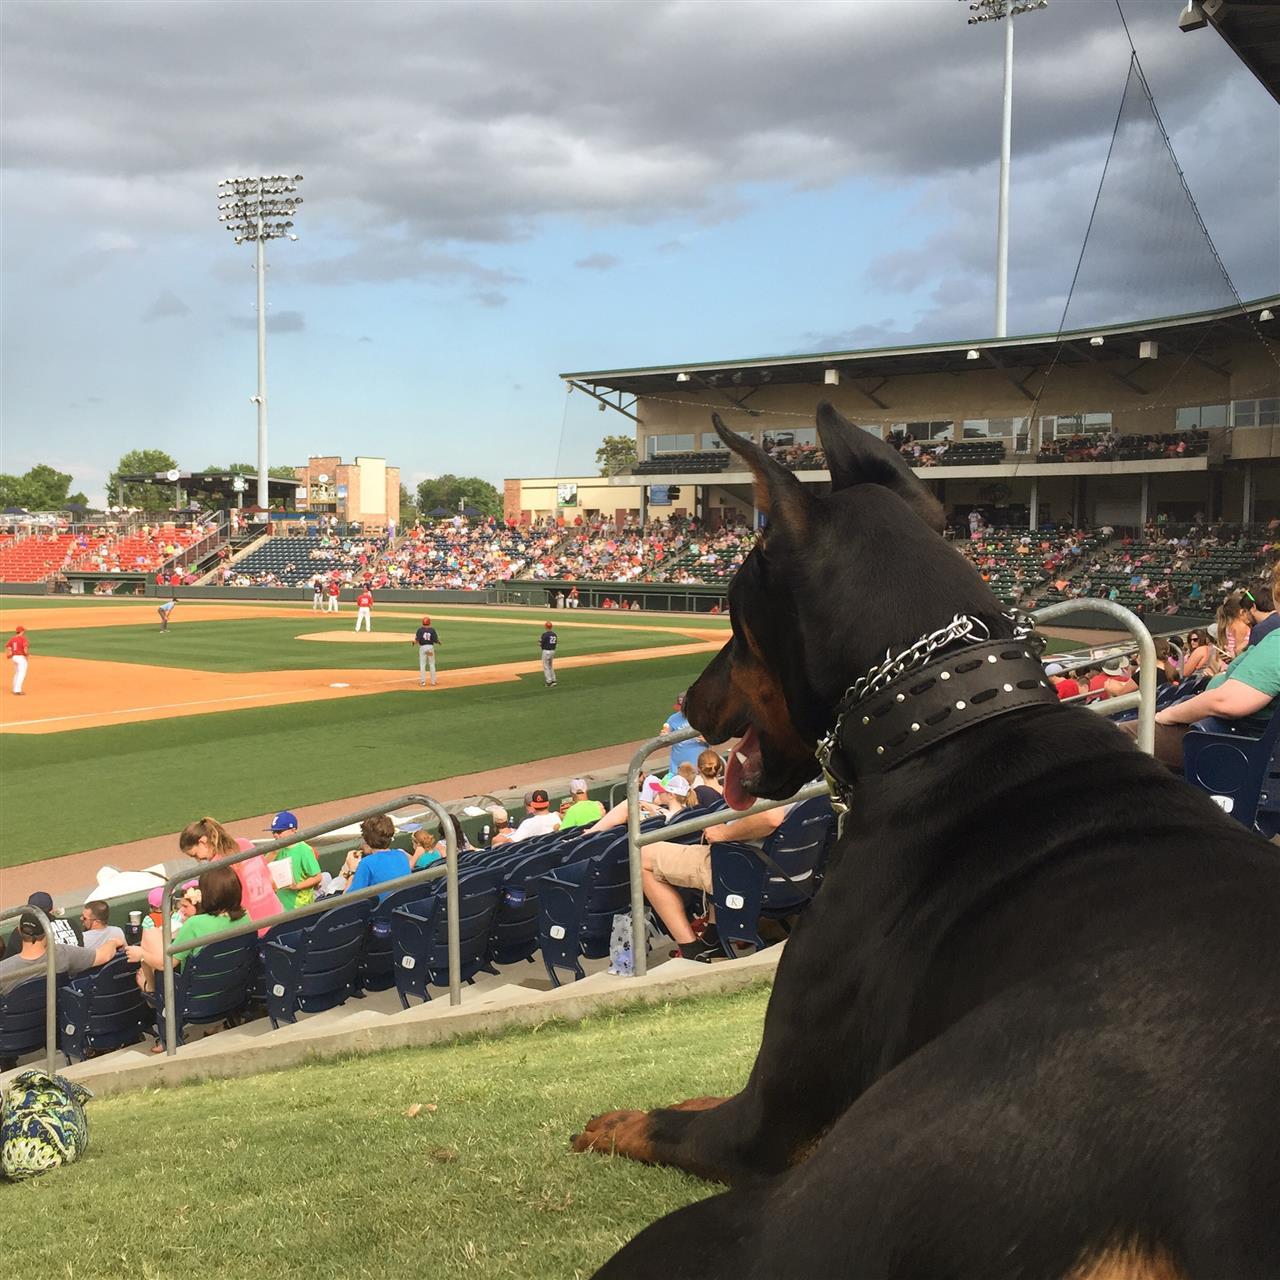 #BarkInThePark at the #GreenvilleDrive baseball game! #Greenville #SouthCarolina #LeadingRELocal #Drive #Baseball